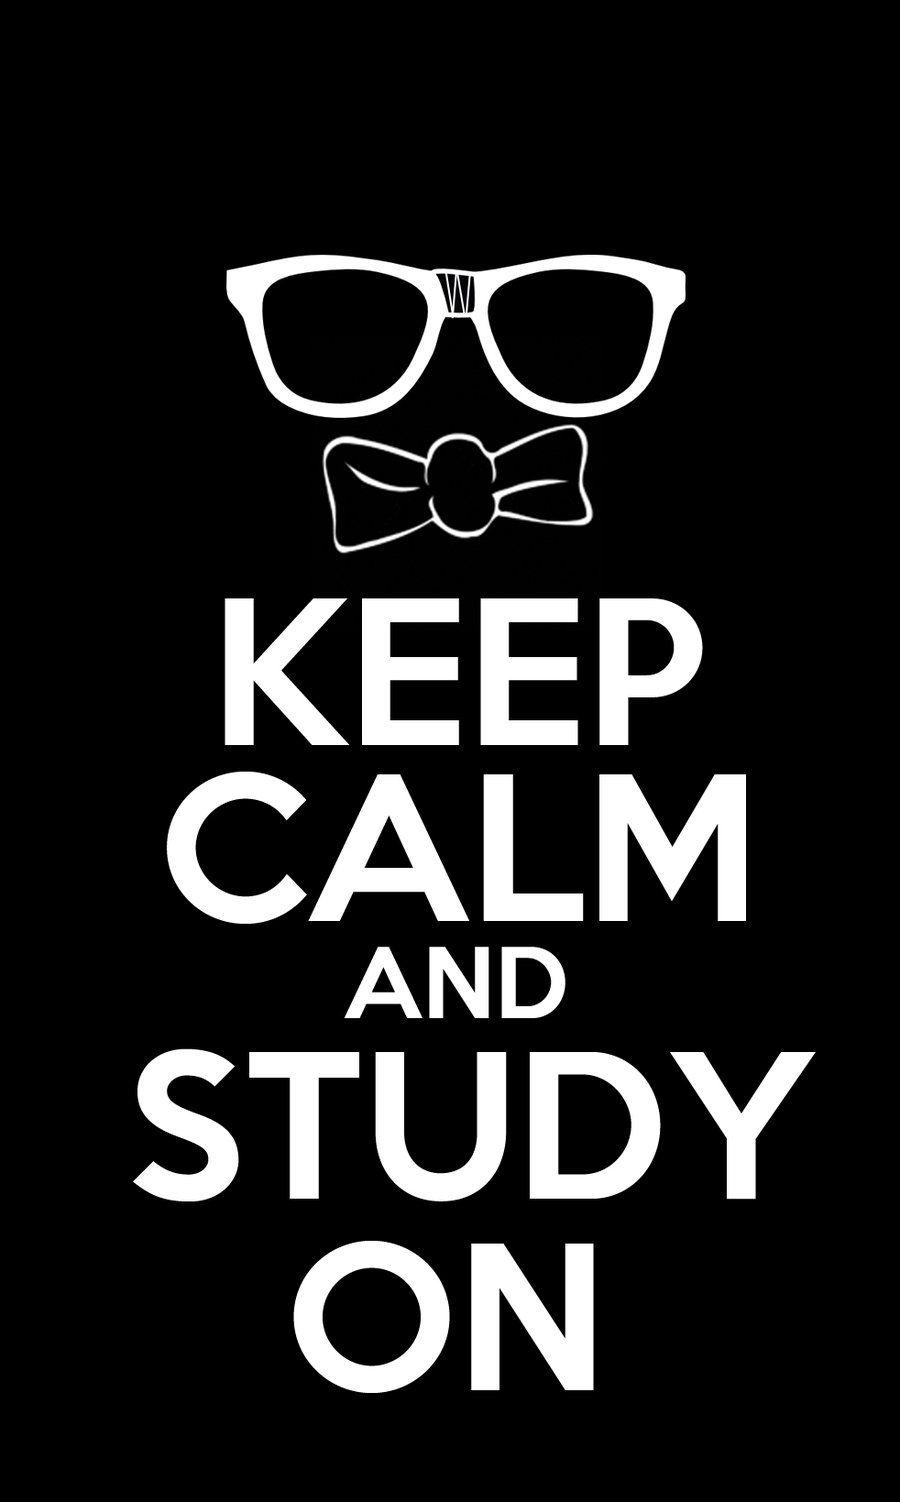 Keep Calm and Study On by kennychau on DeviantArt | keep ...